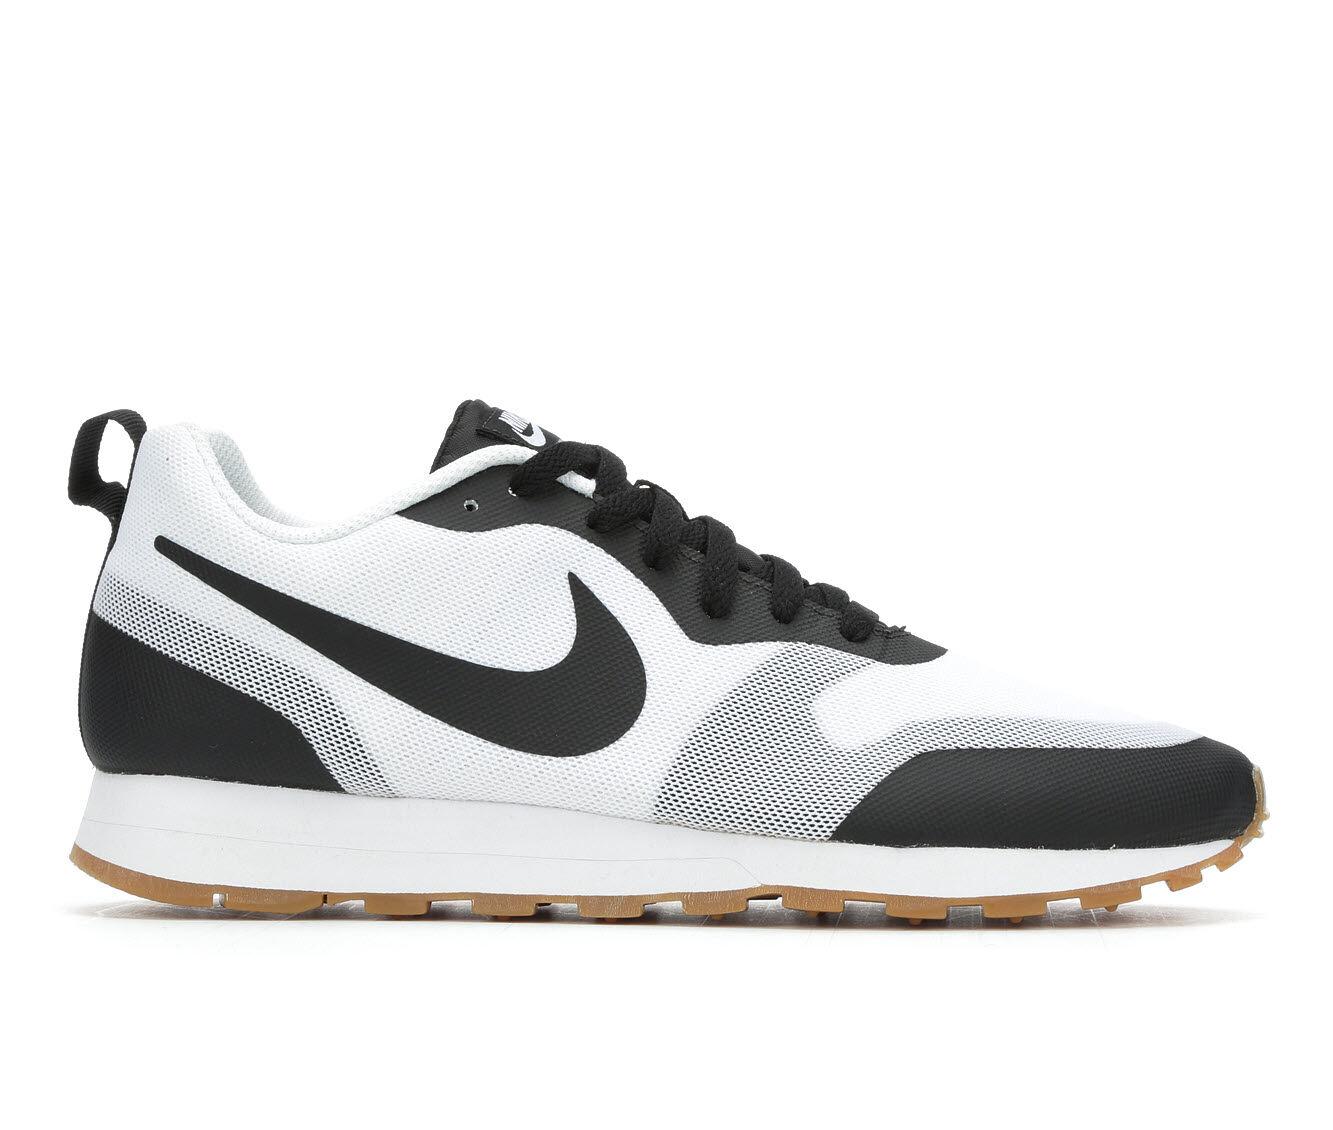 Men's Nike MD Runner 2 19 Sneakers